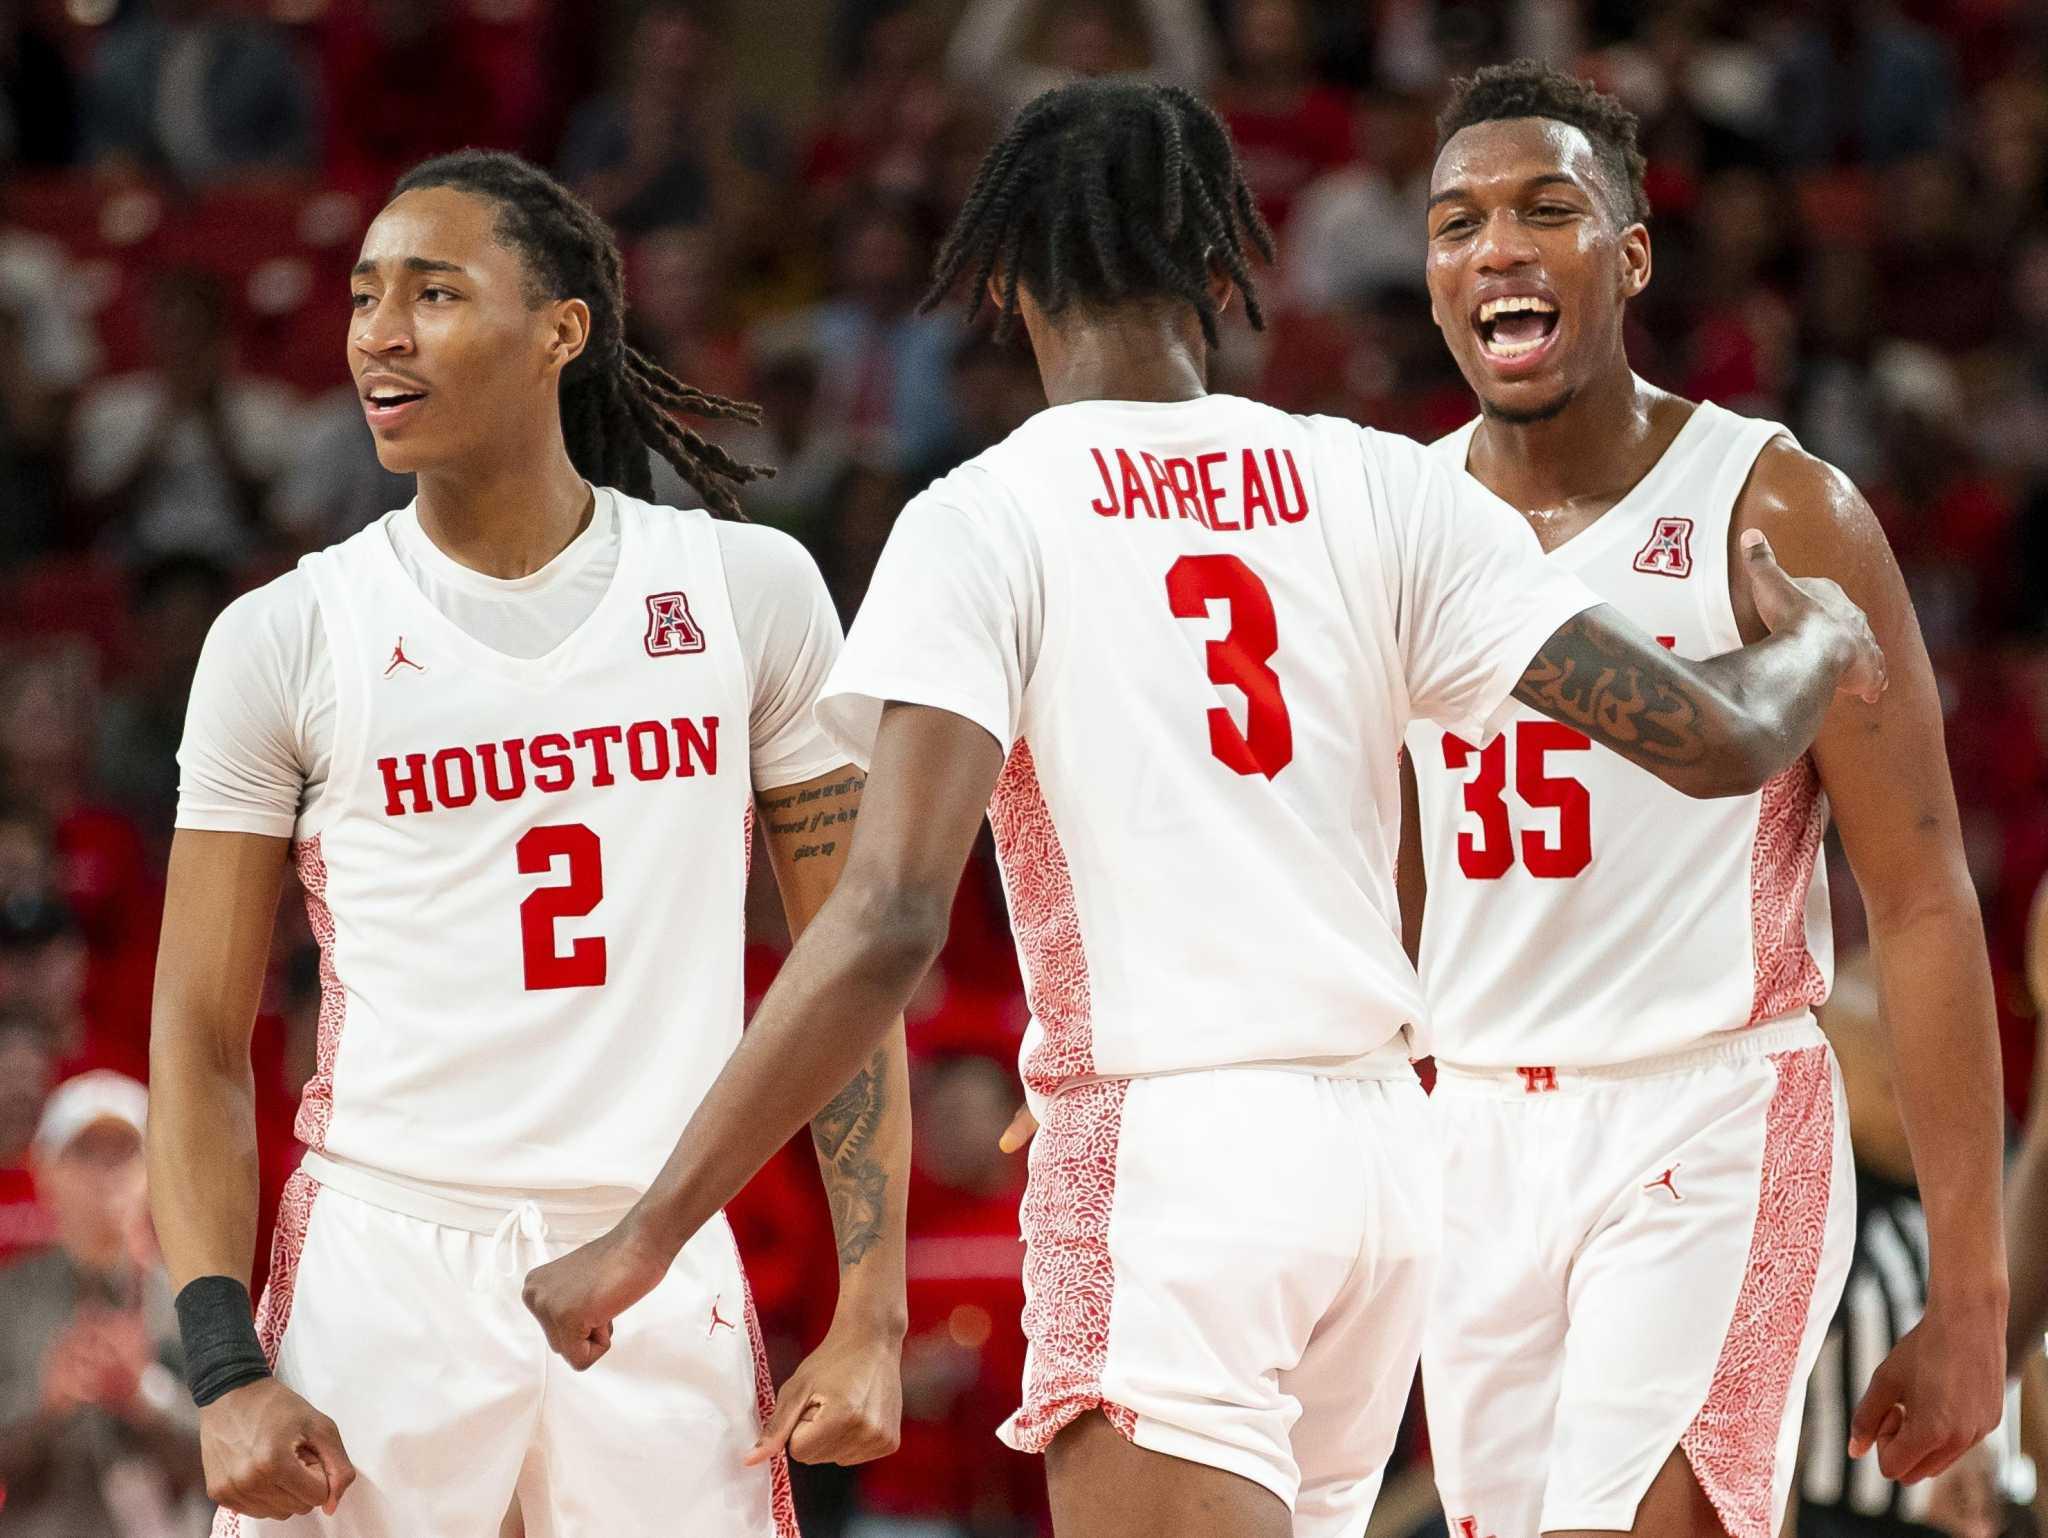 Men's basketball preview: No. 25 Houston vs. USF